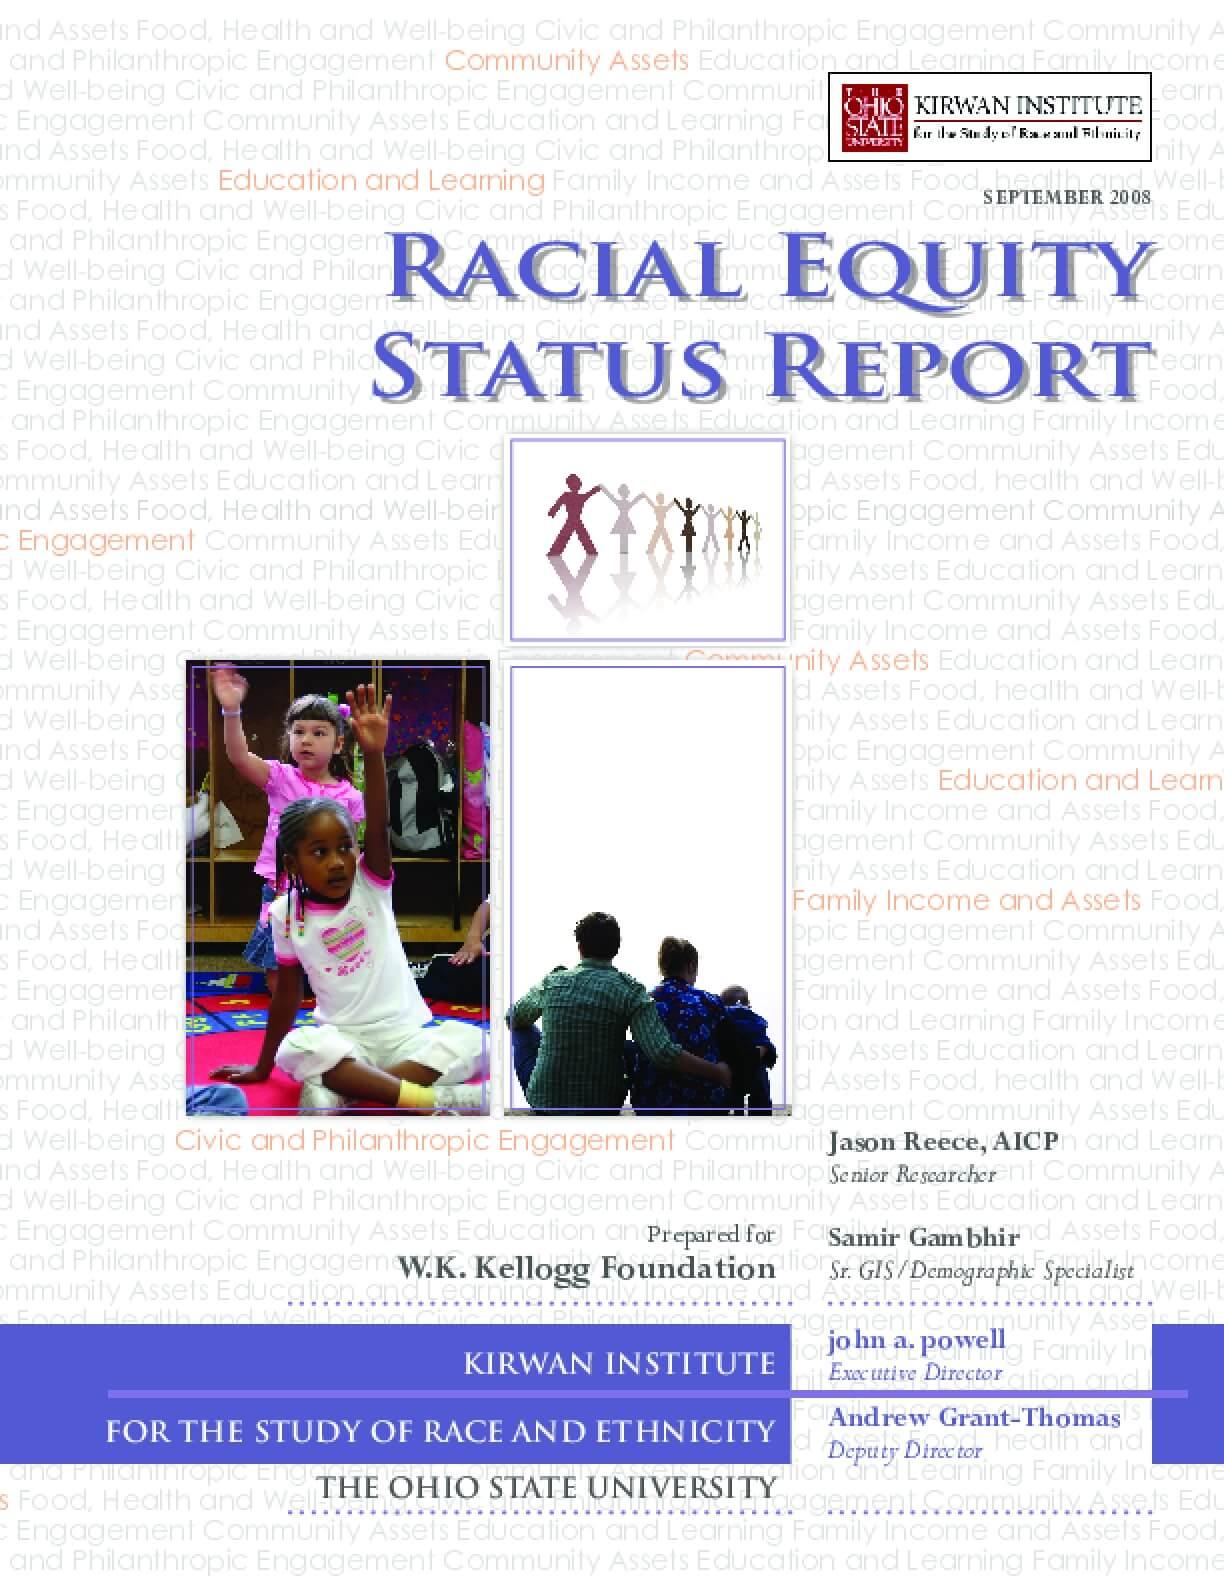 Racial Equity Status Report